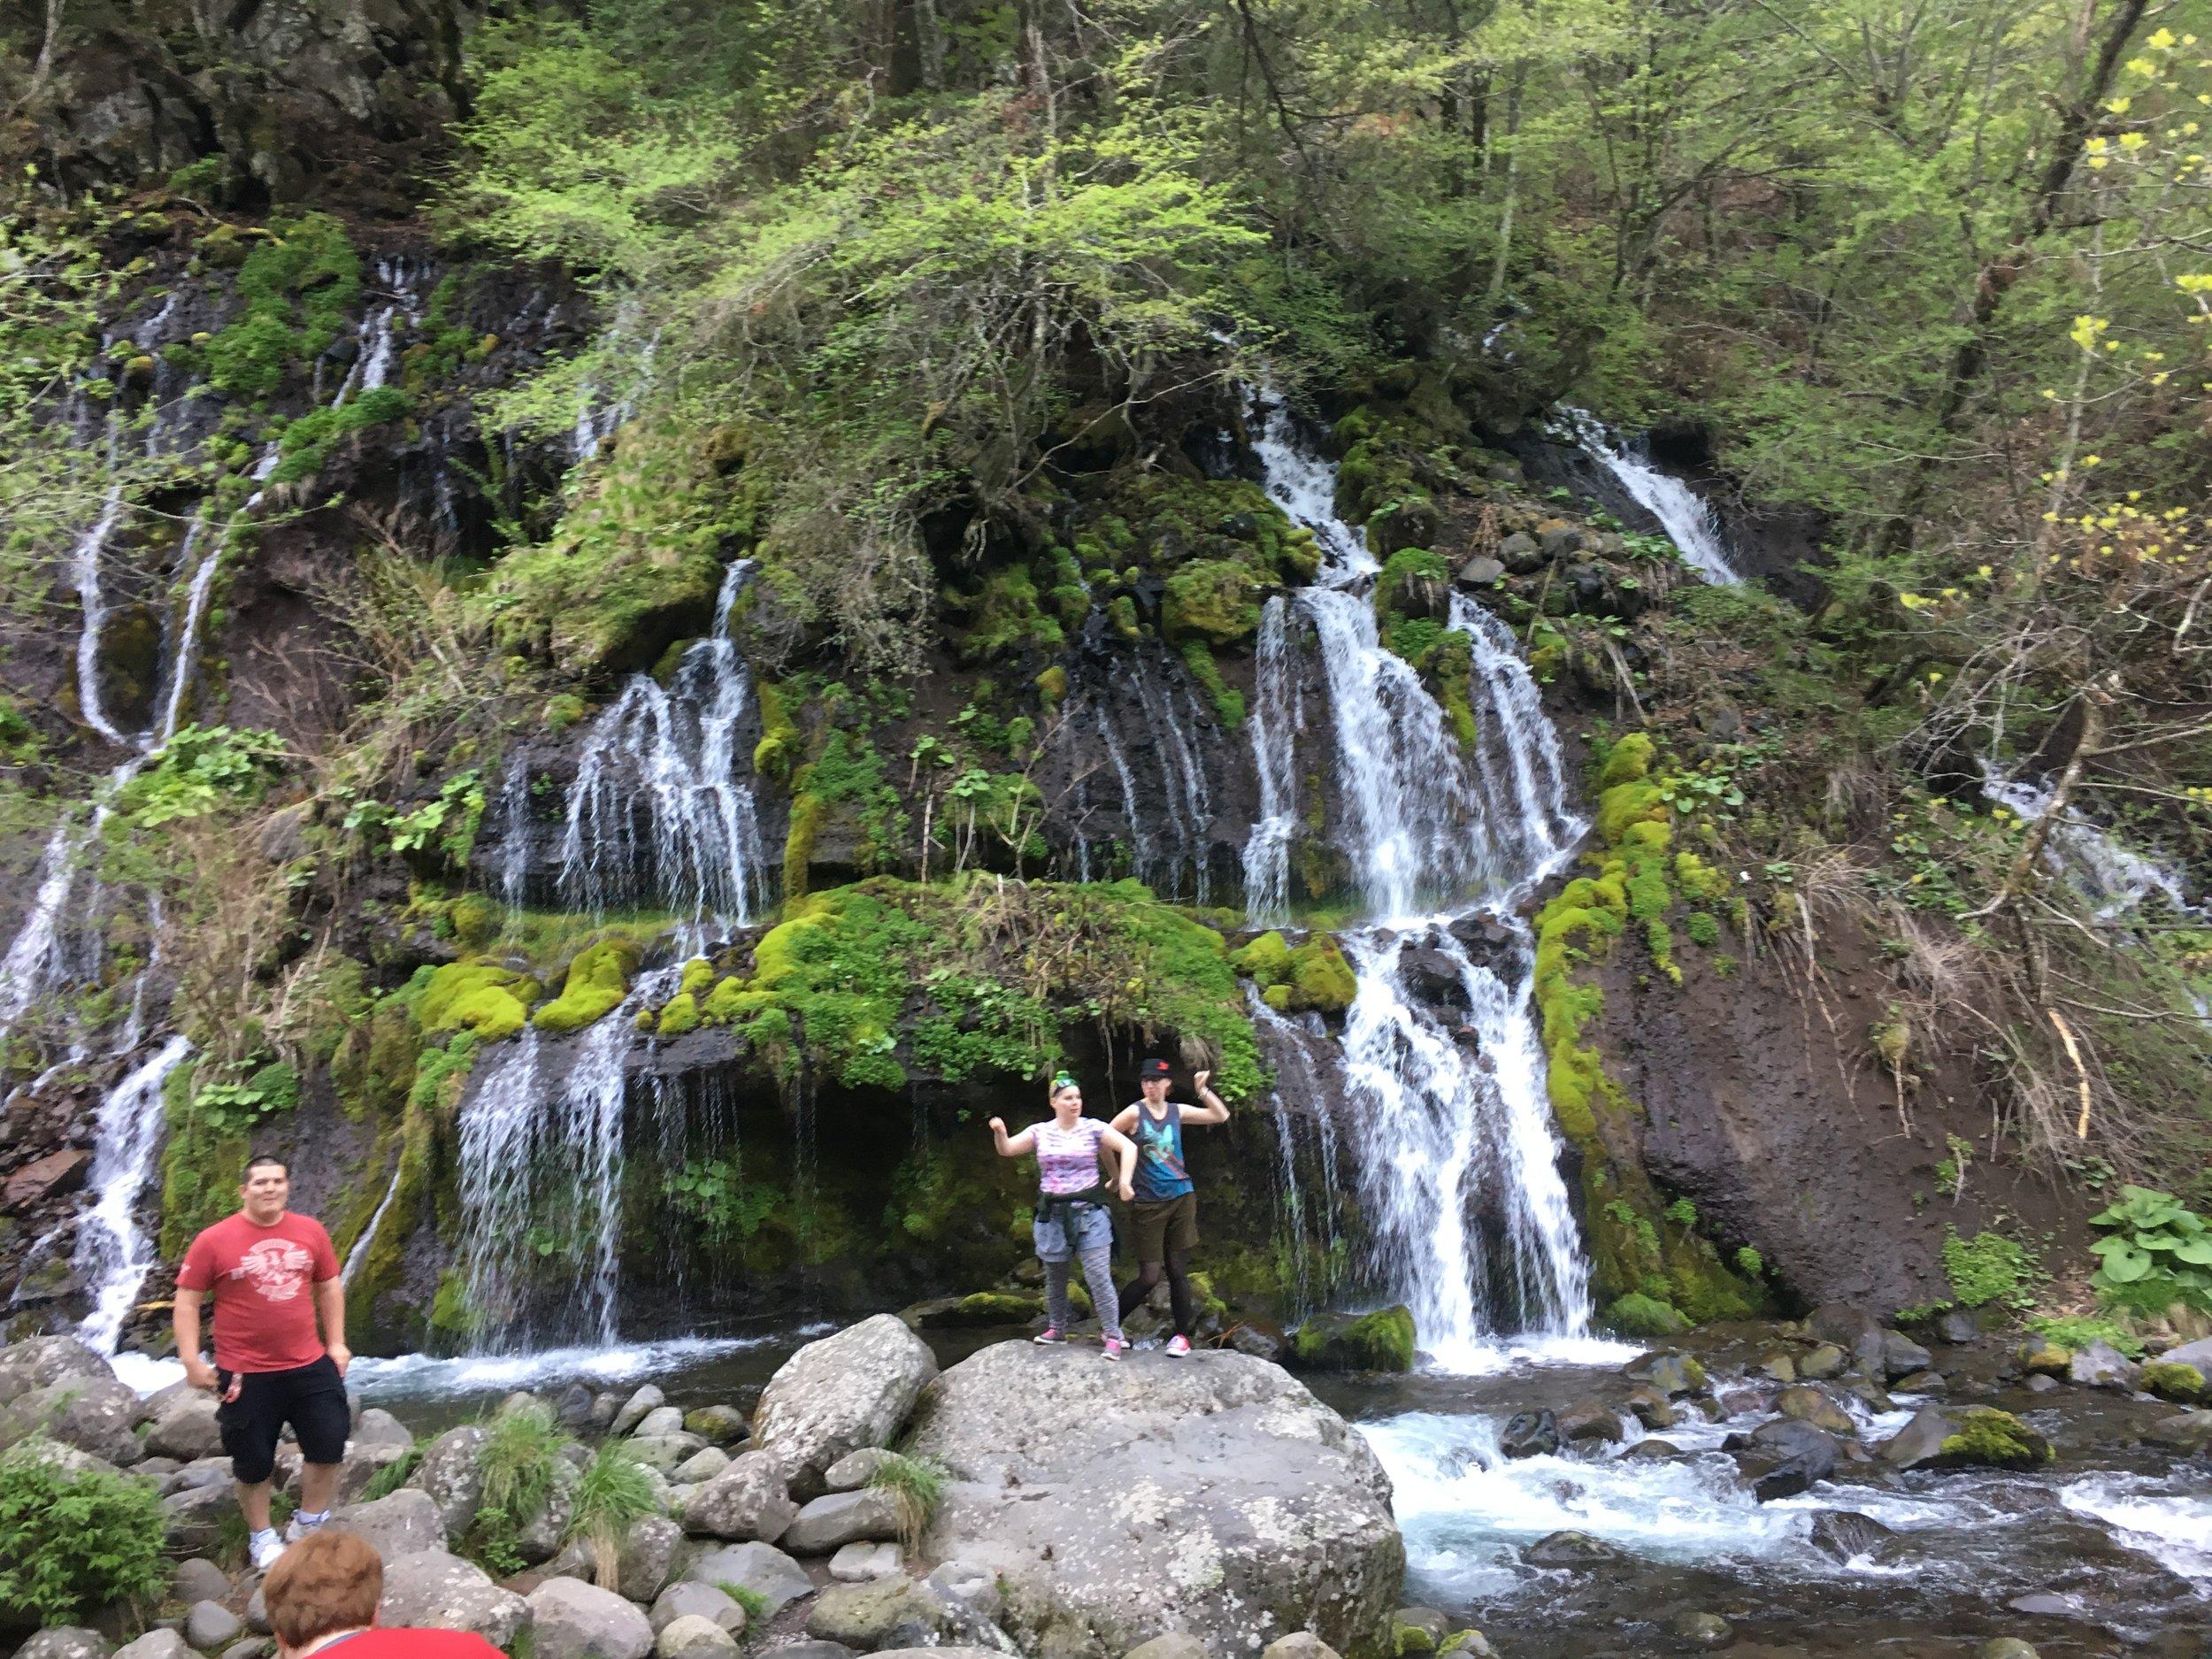 Day 5: Waterfalls worth chasing